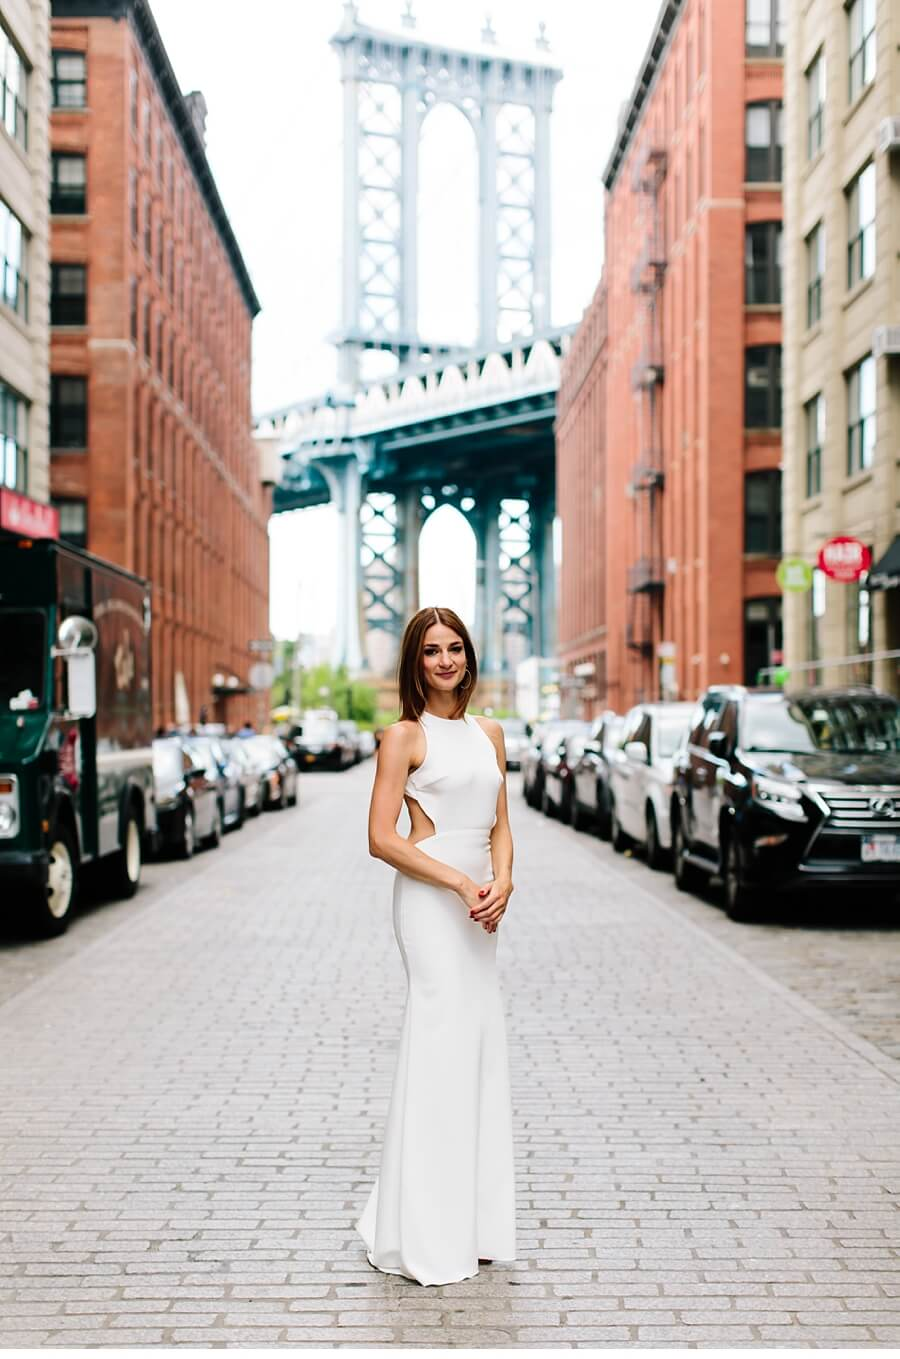 Bridal_Wedding_Imagery_18.jpg